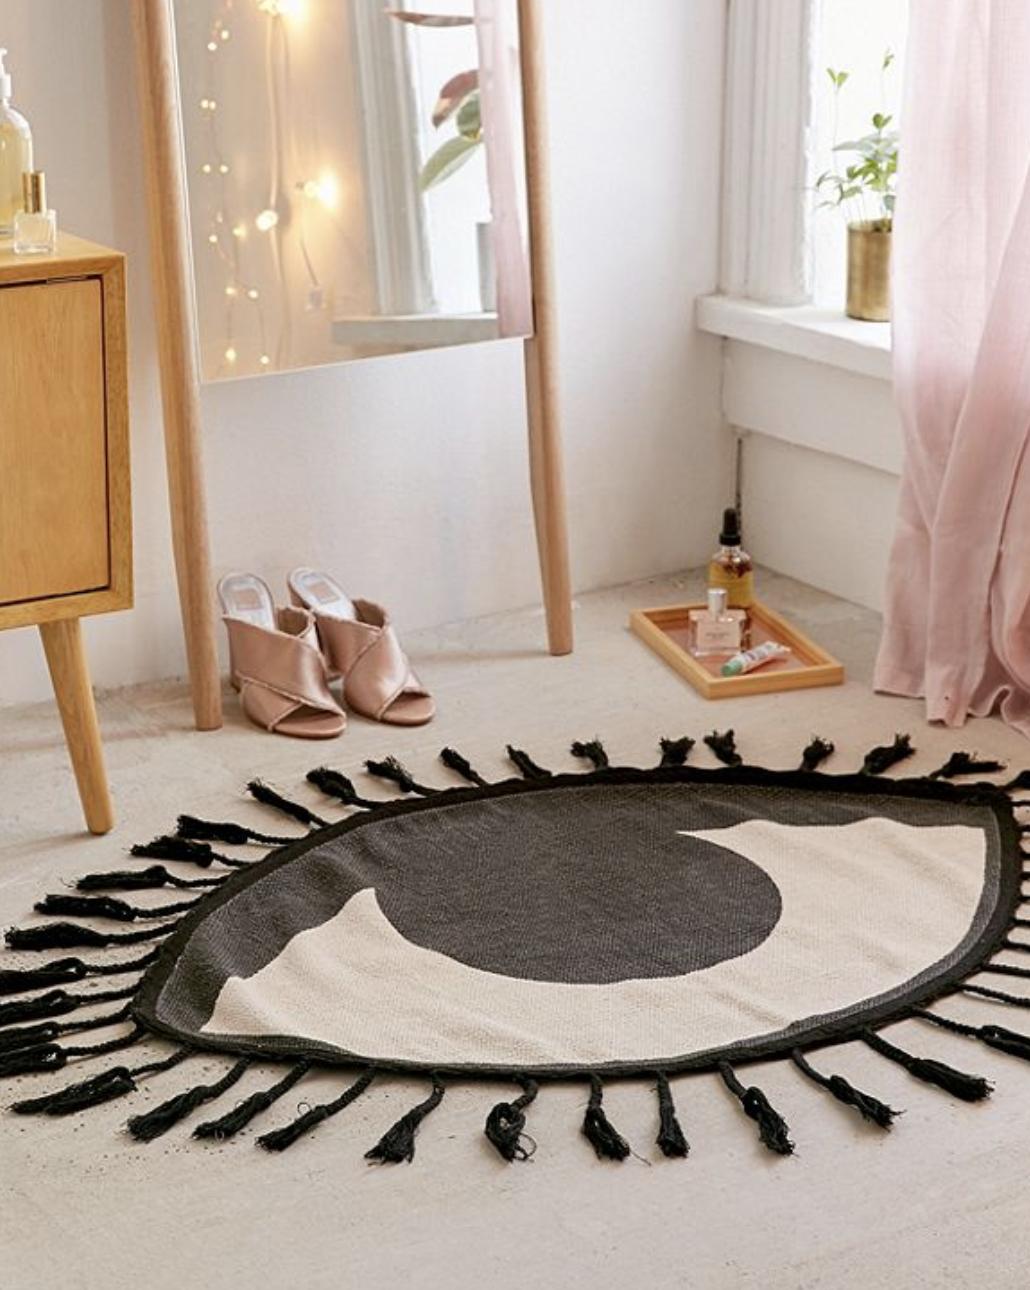 Tasseled Eye Rug College Apartment Decor Dorm Rugs